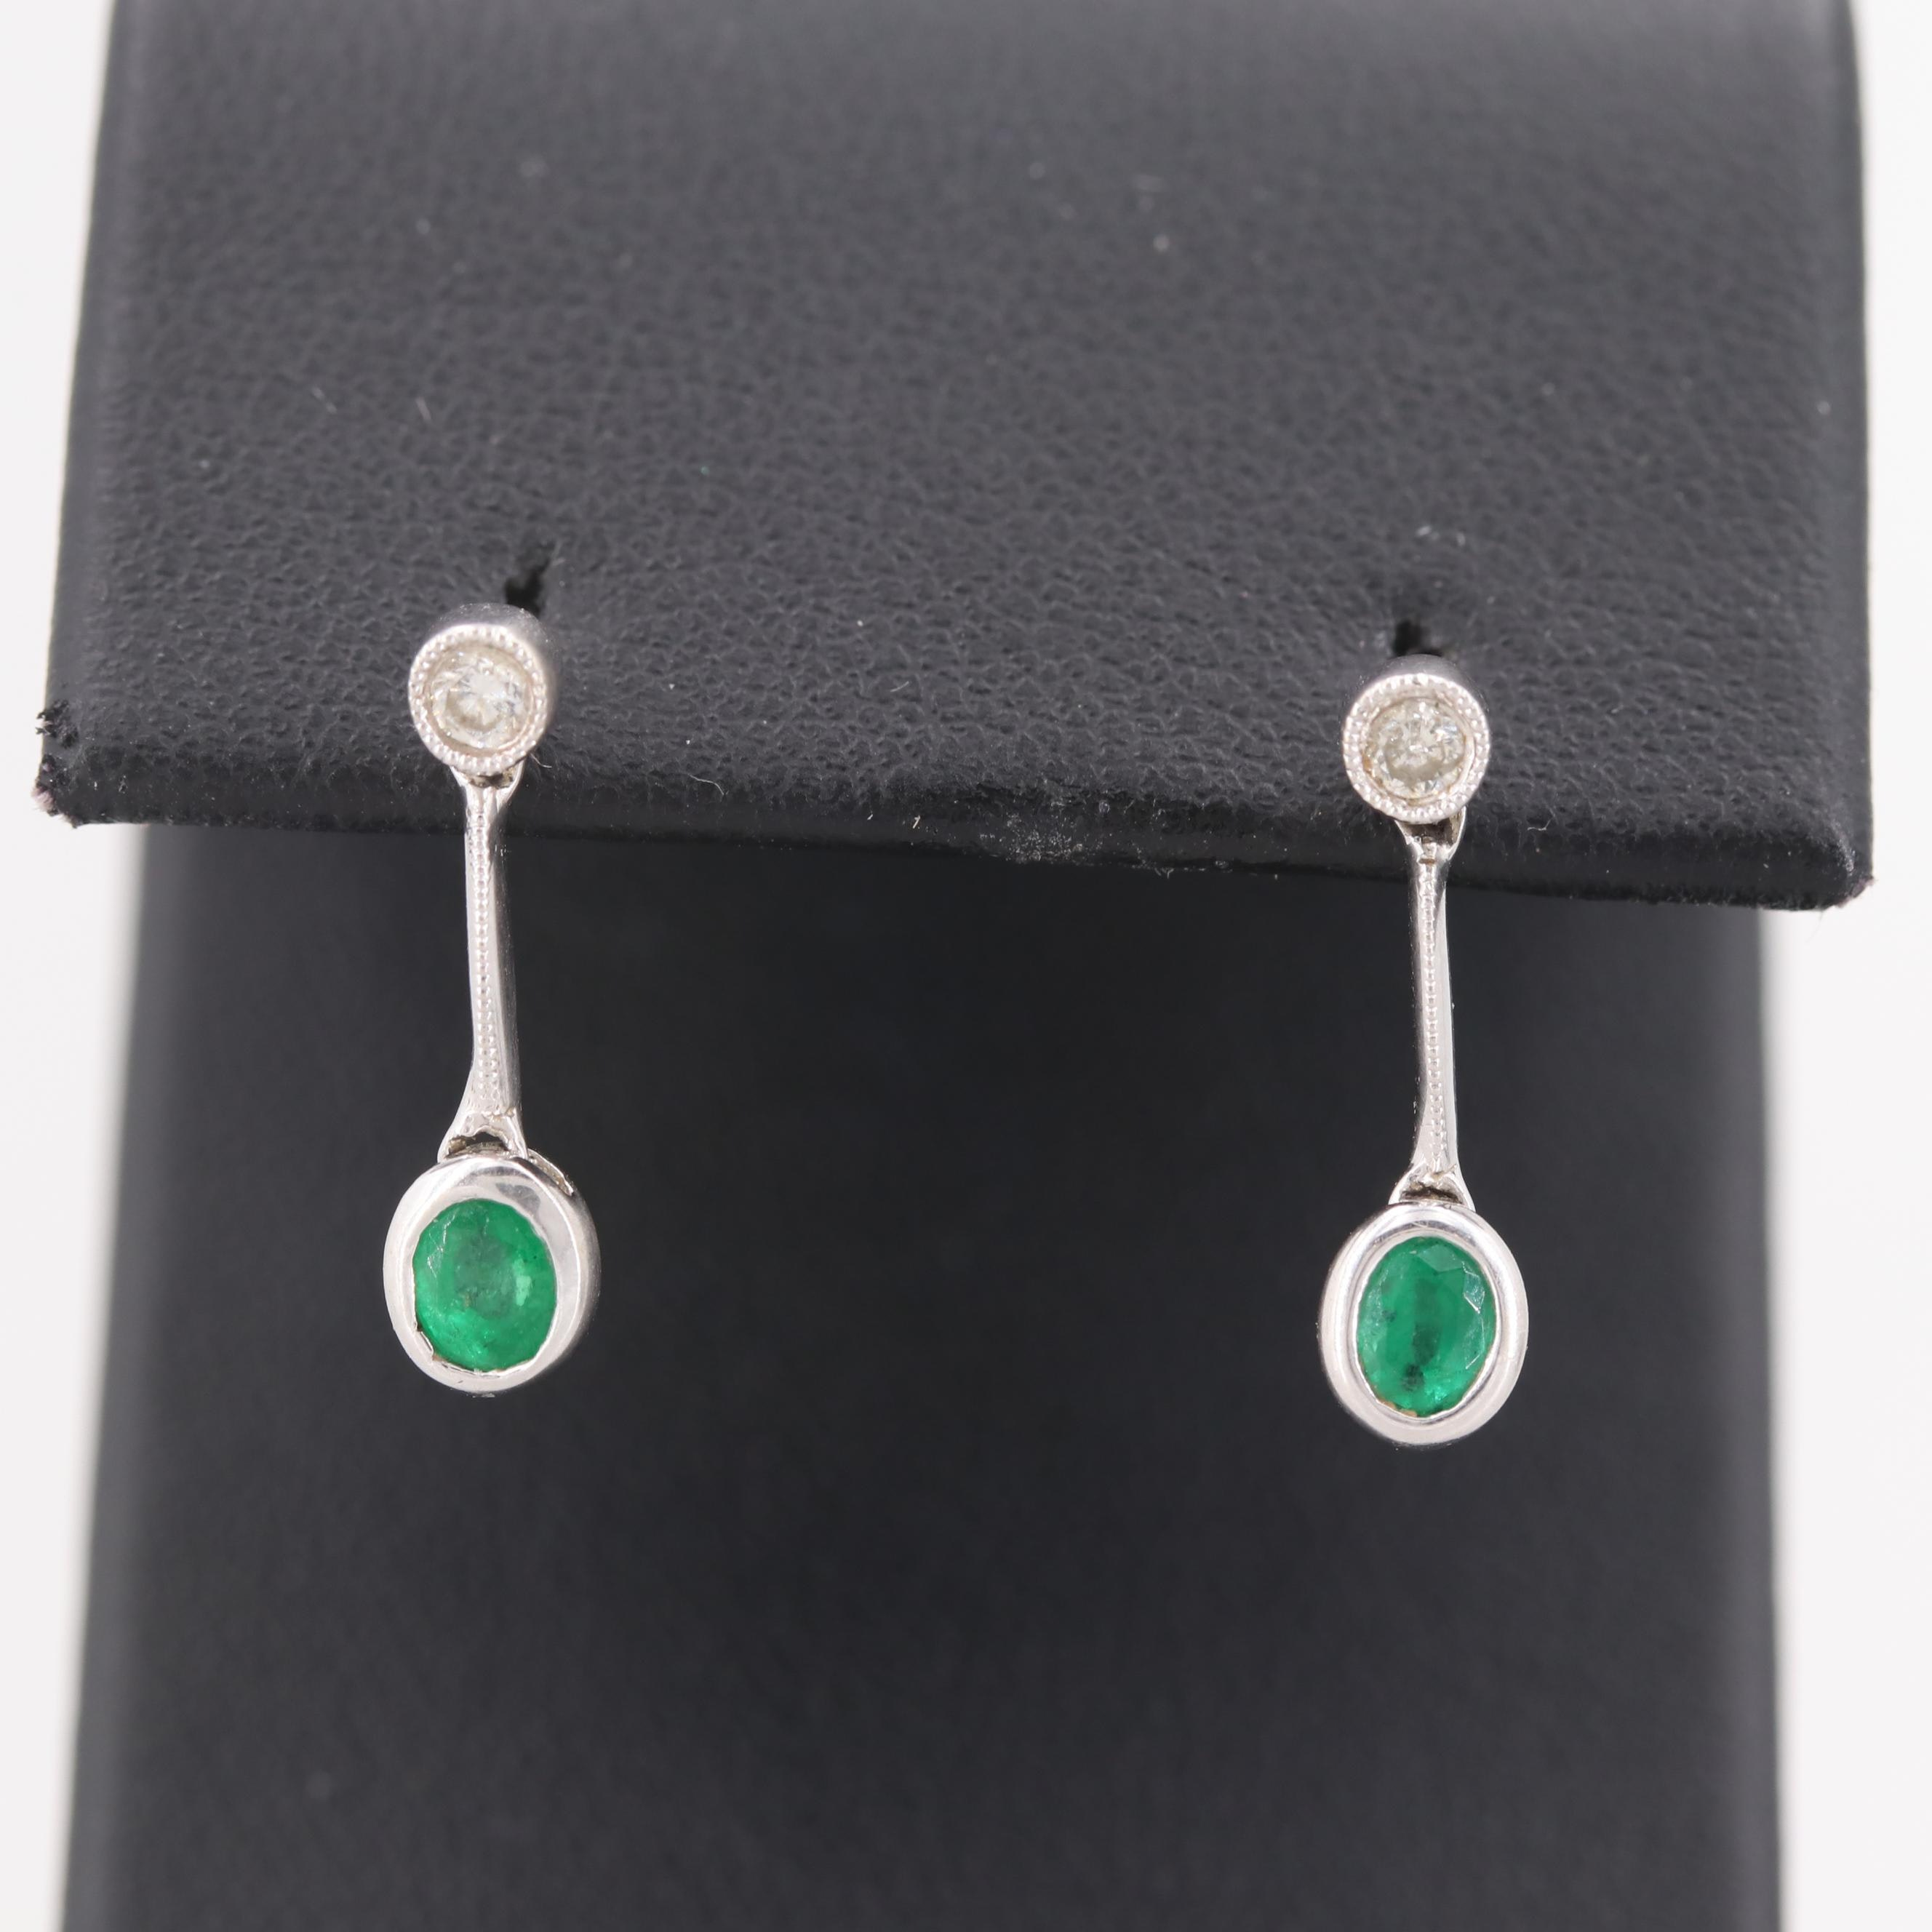 18K White Gold Diamond and Emerald Earrings